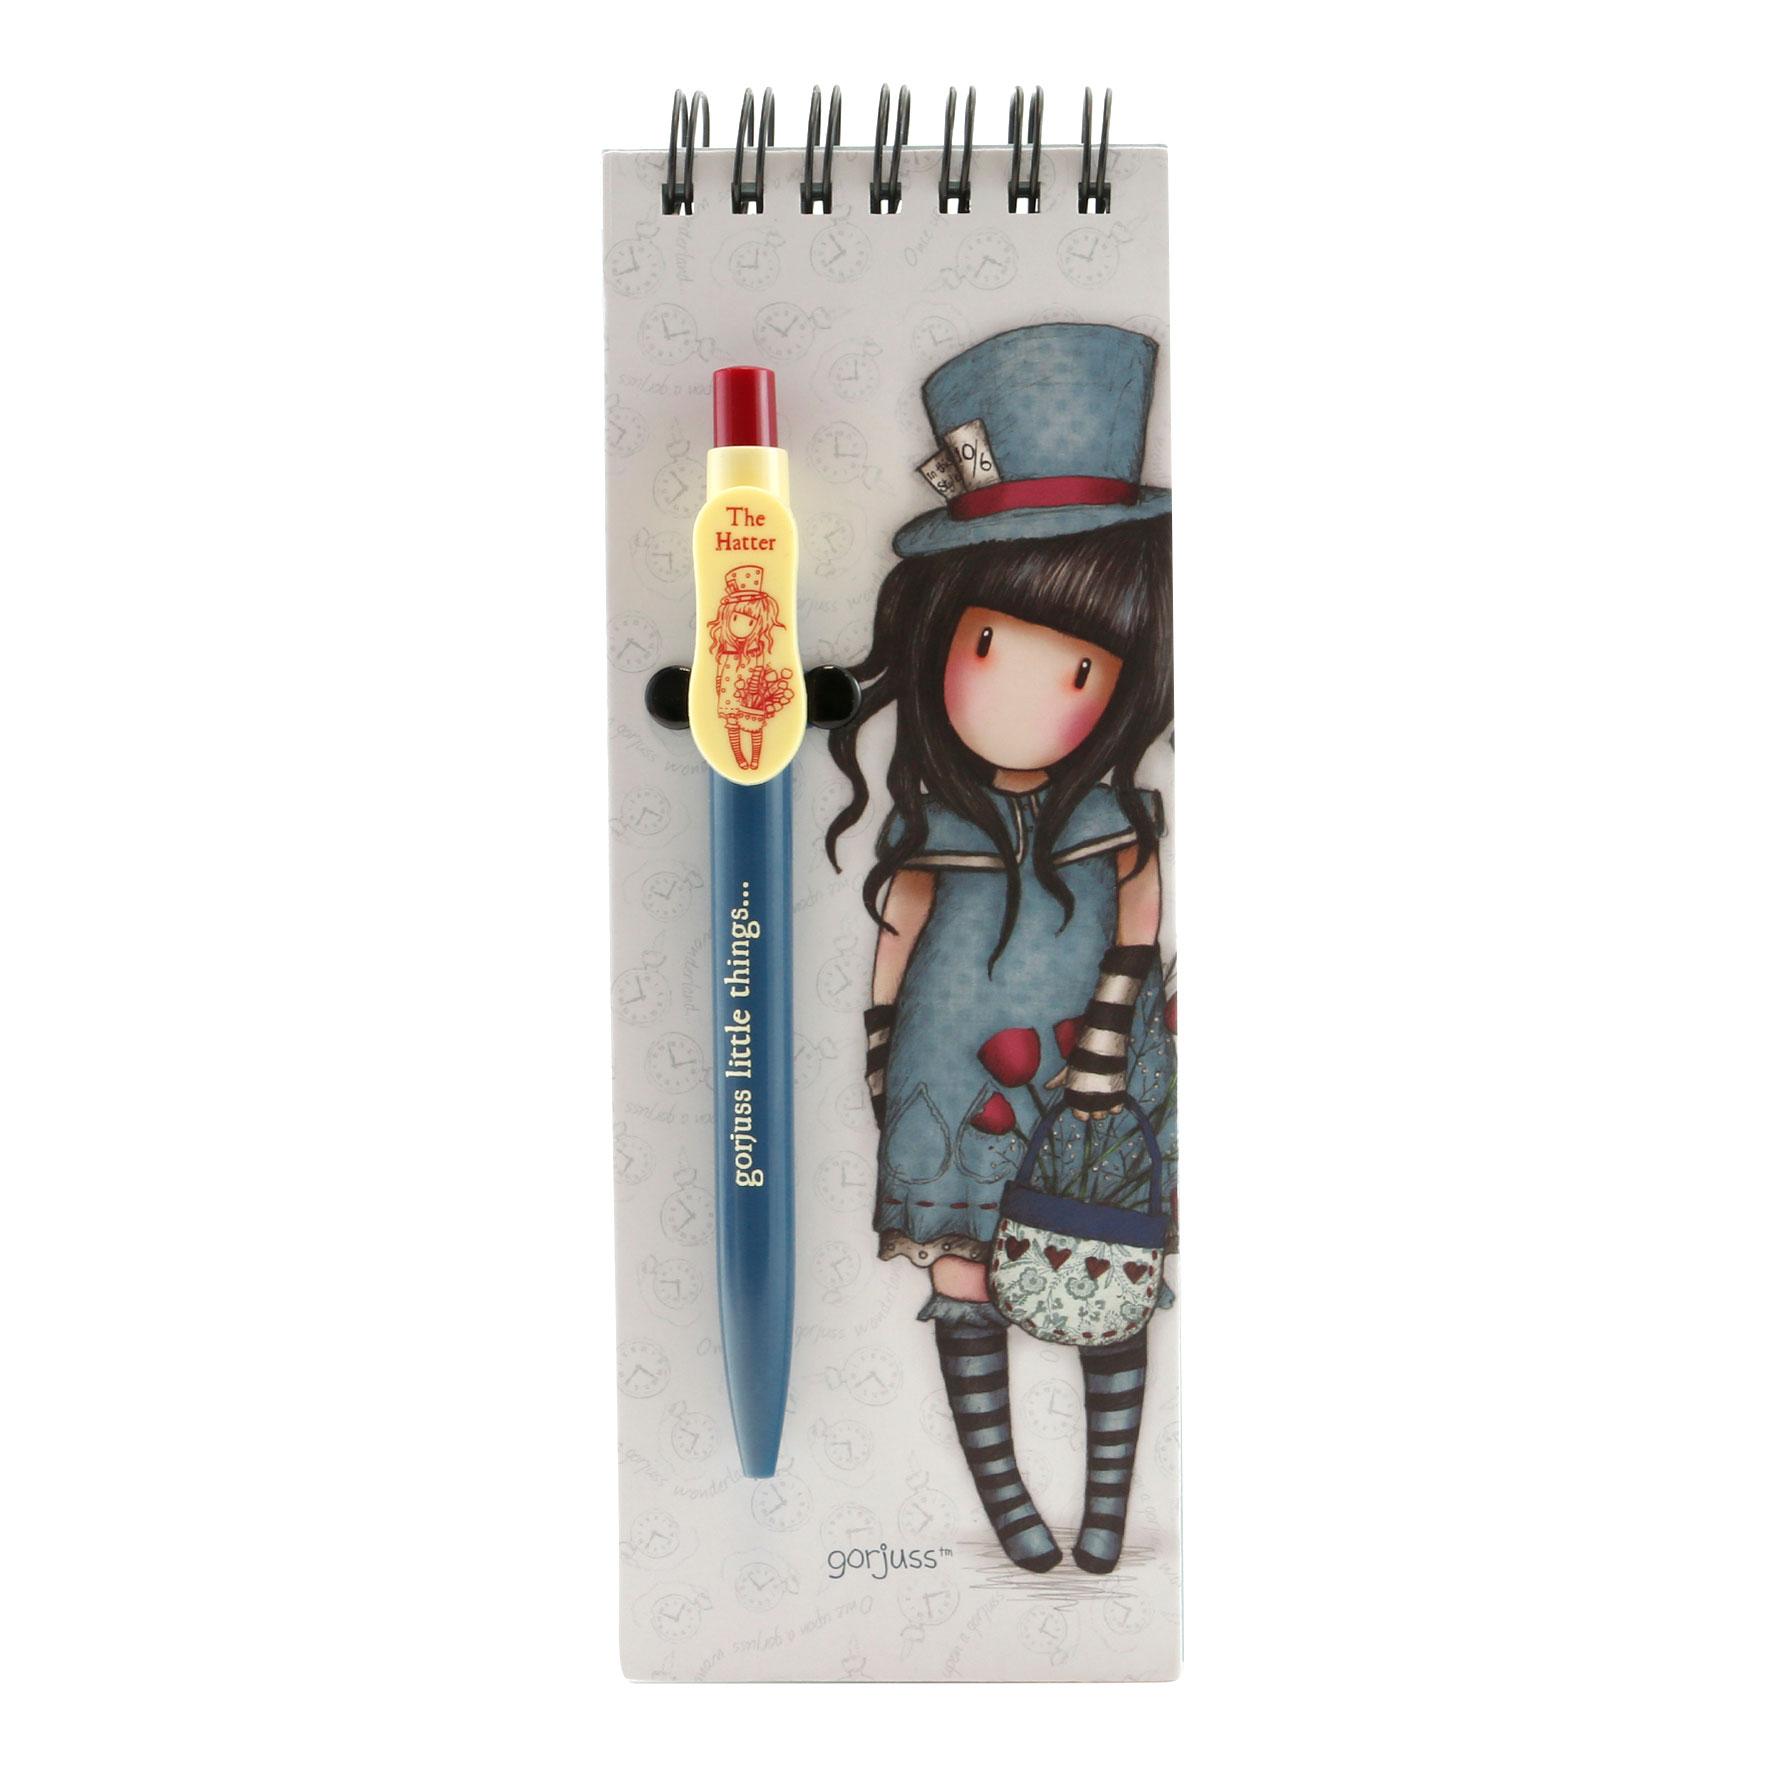 Santoro London - Zápisník s propiskou (malý) - Gorjuss - Little Red Riding Hood (1)